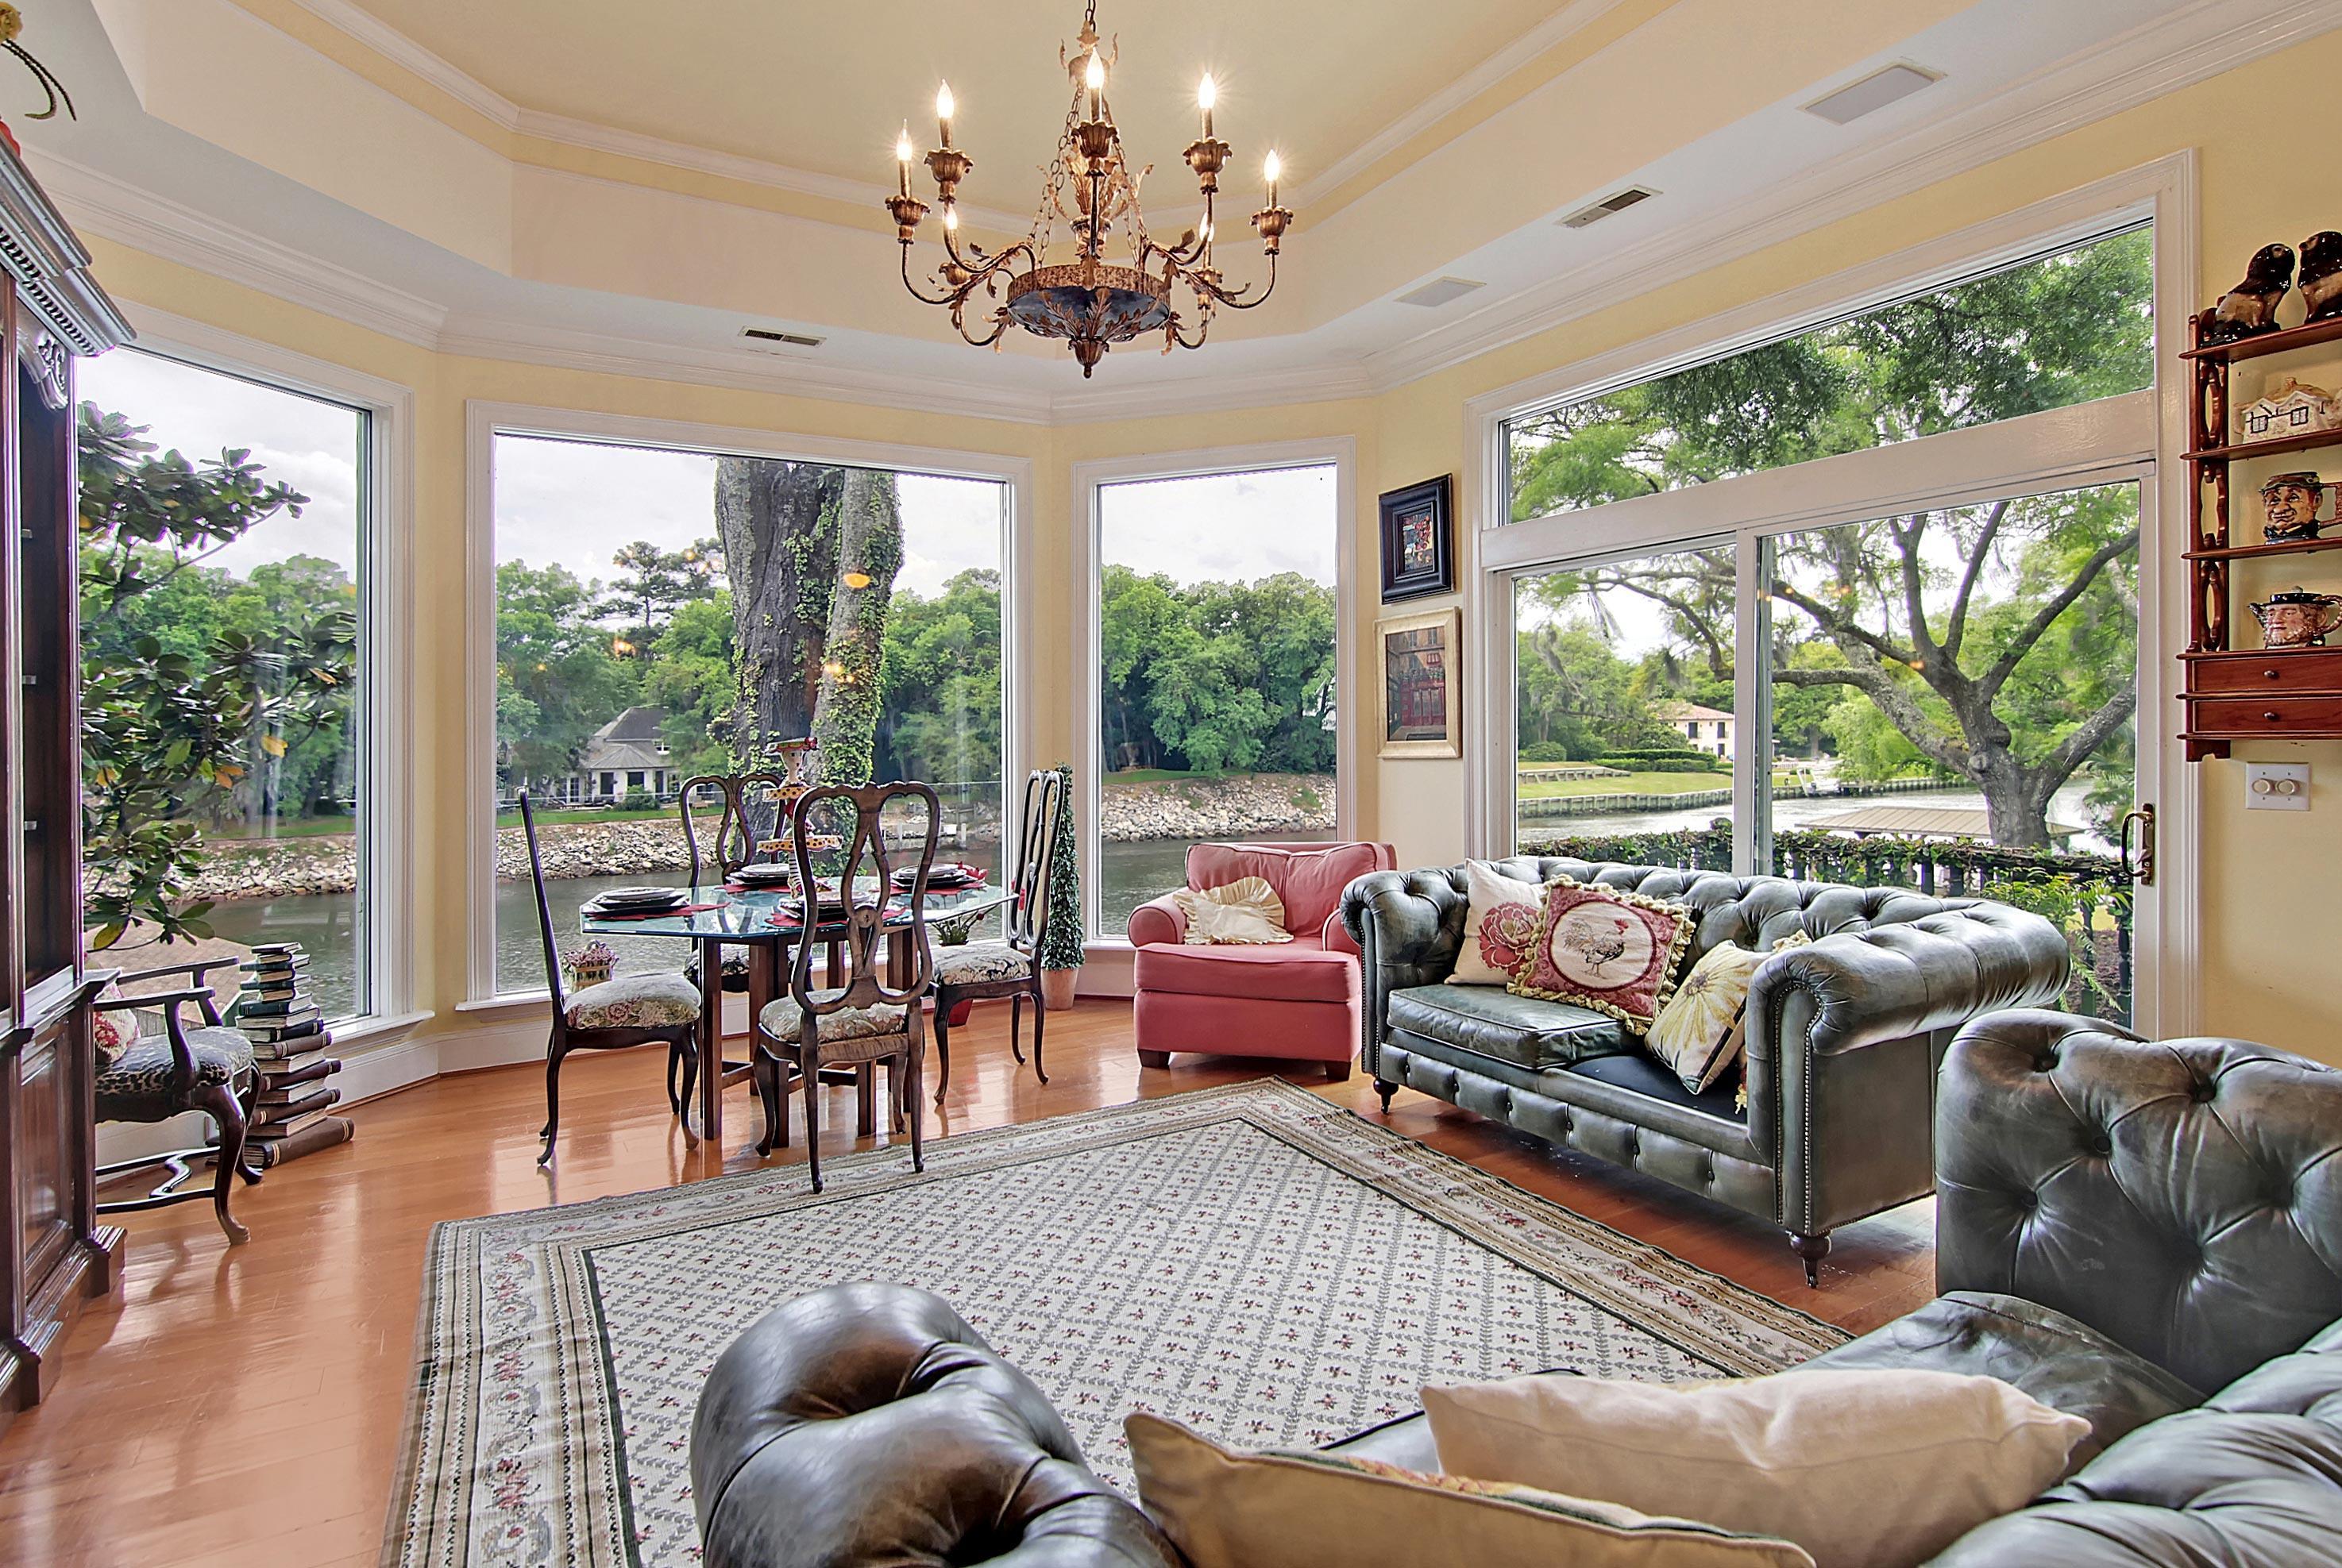 Edgewater Park Homes For Sale - 1323 Edgewater, Charleston, SC - 35